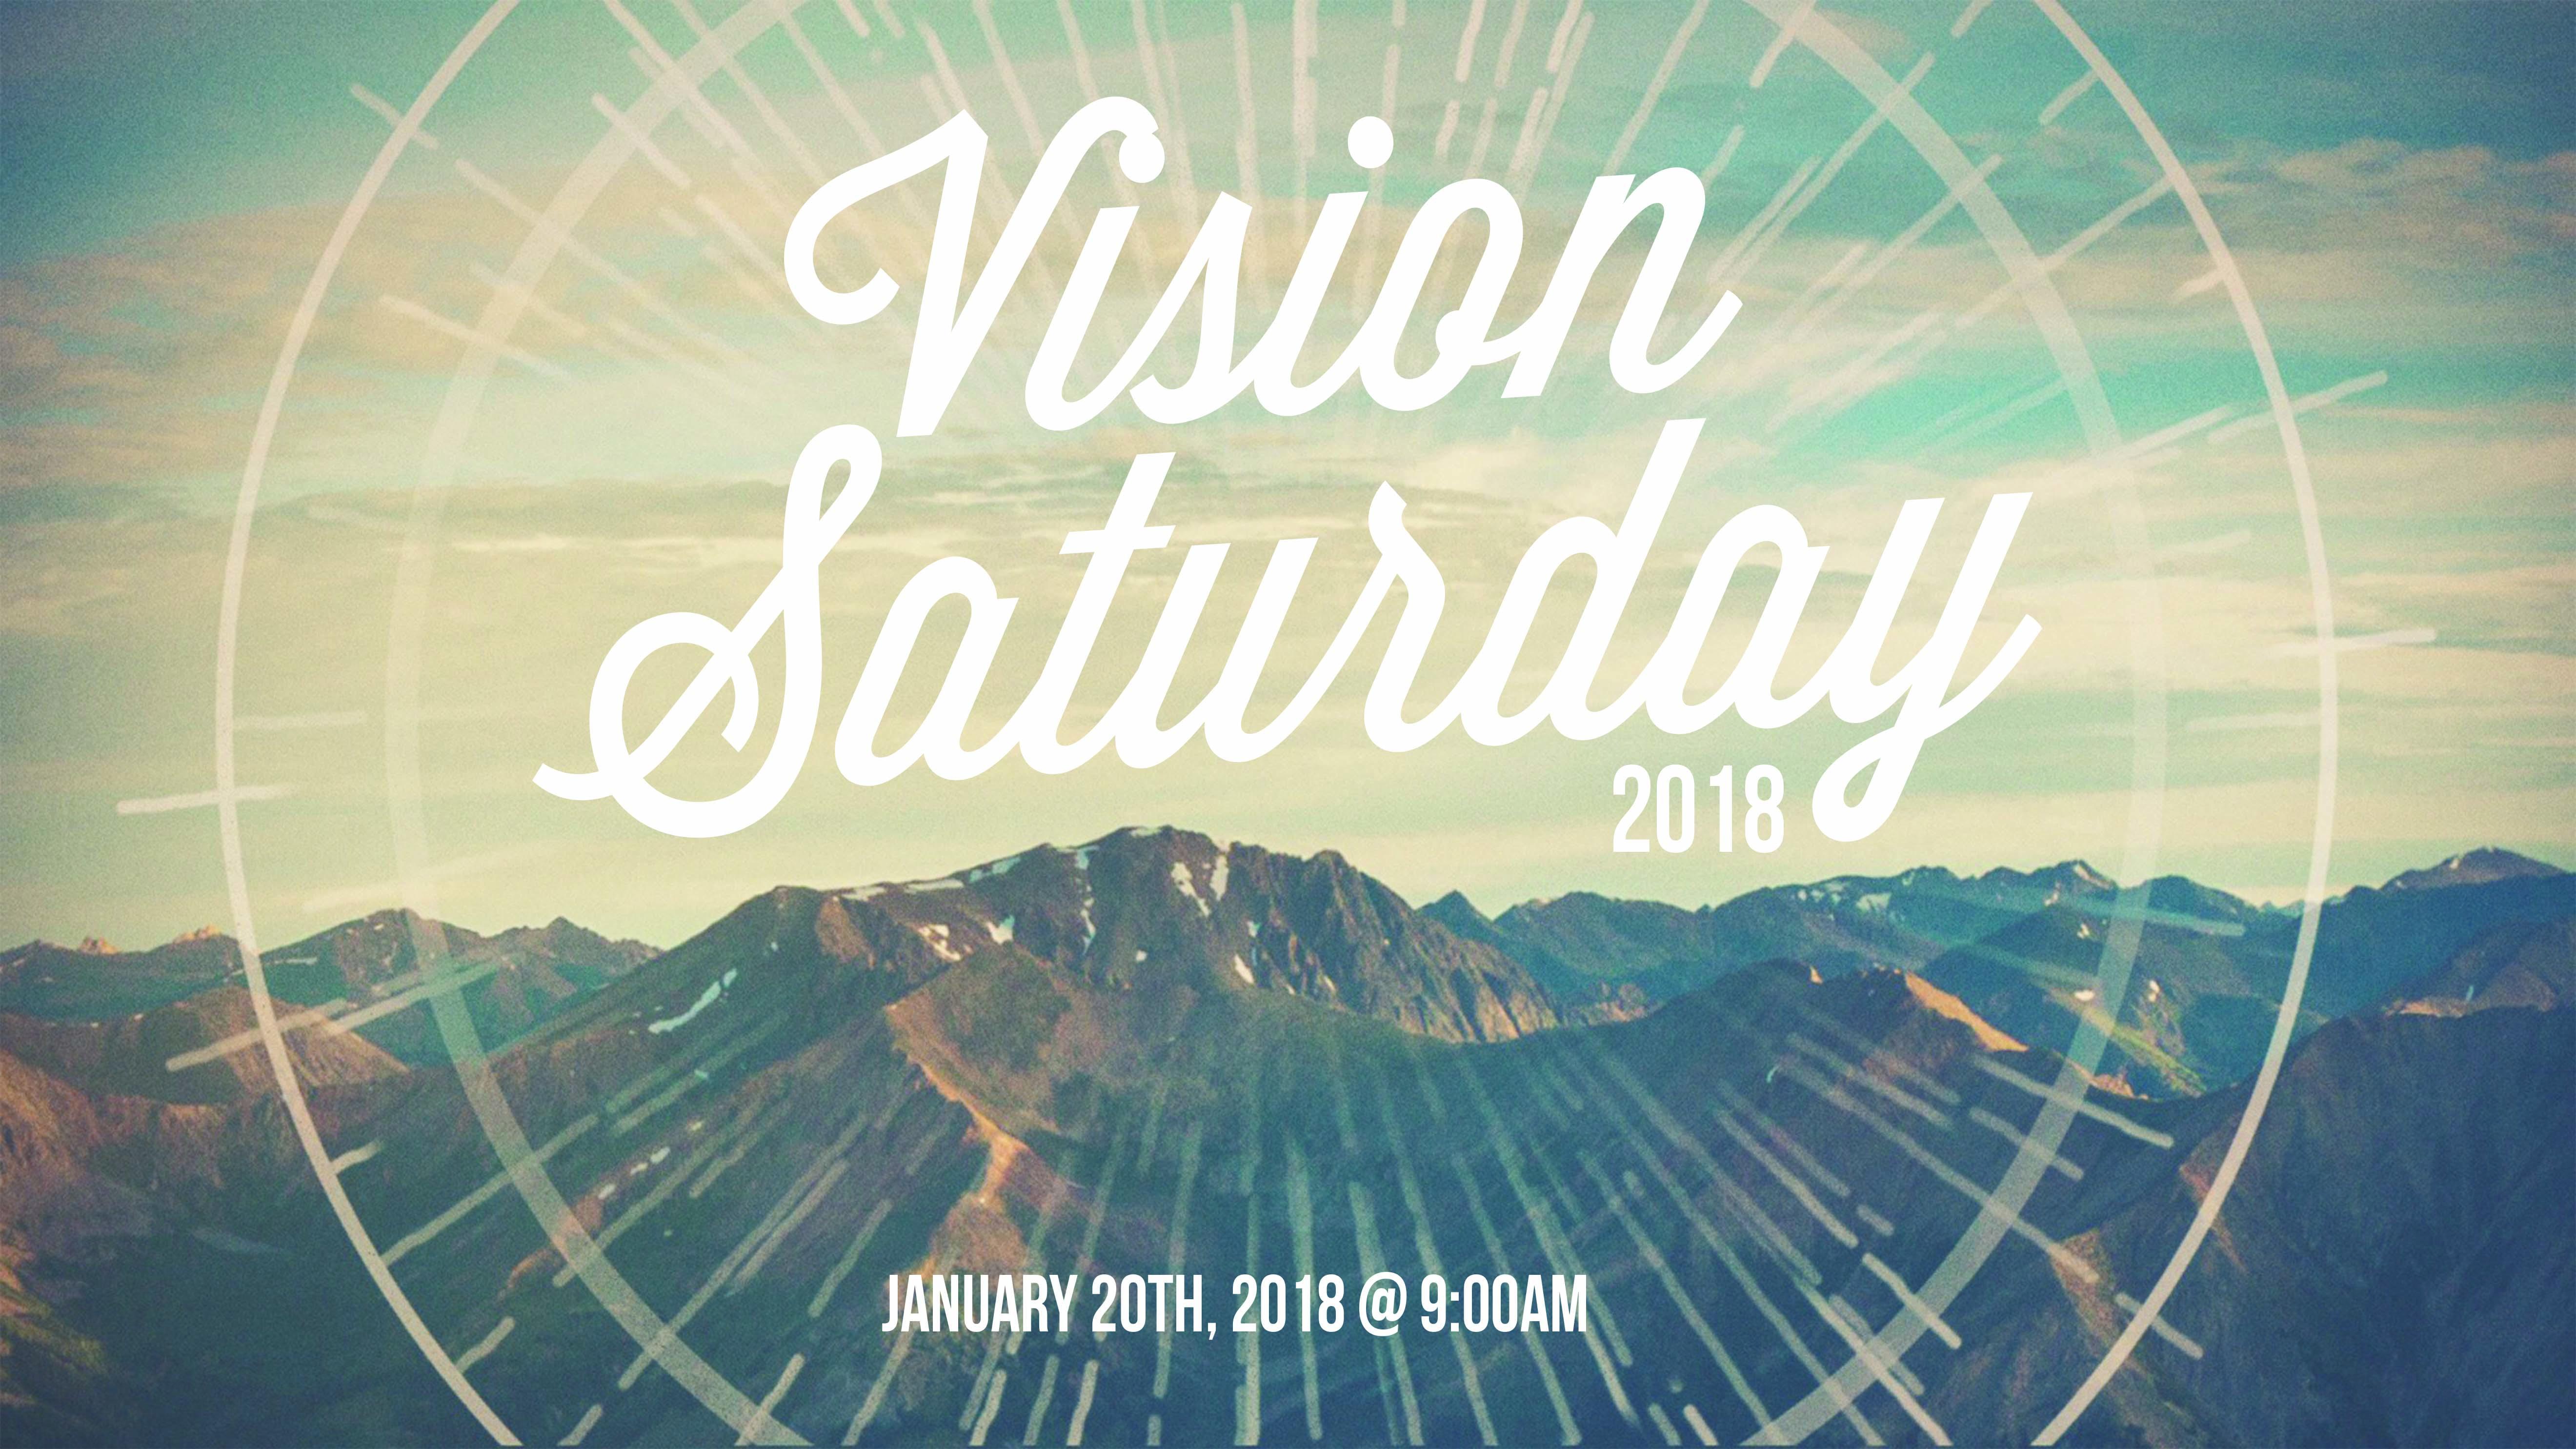 Vision saturday 2018 announce